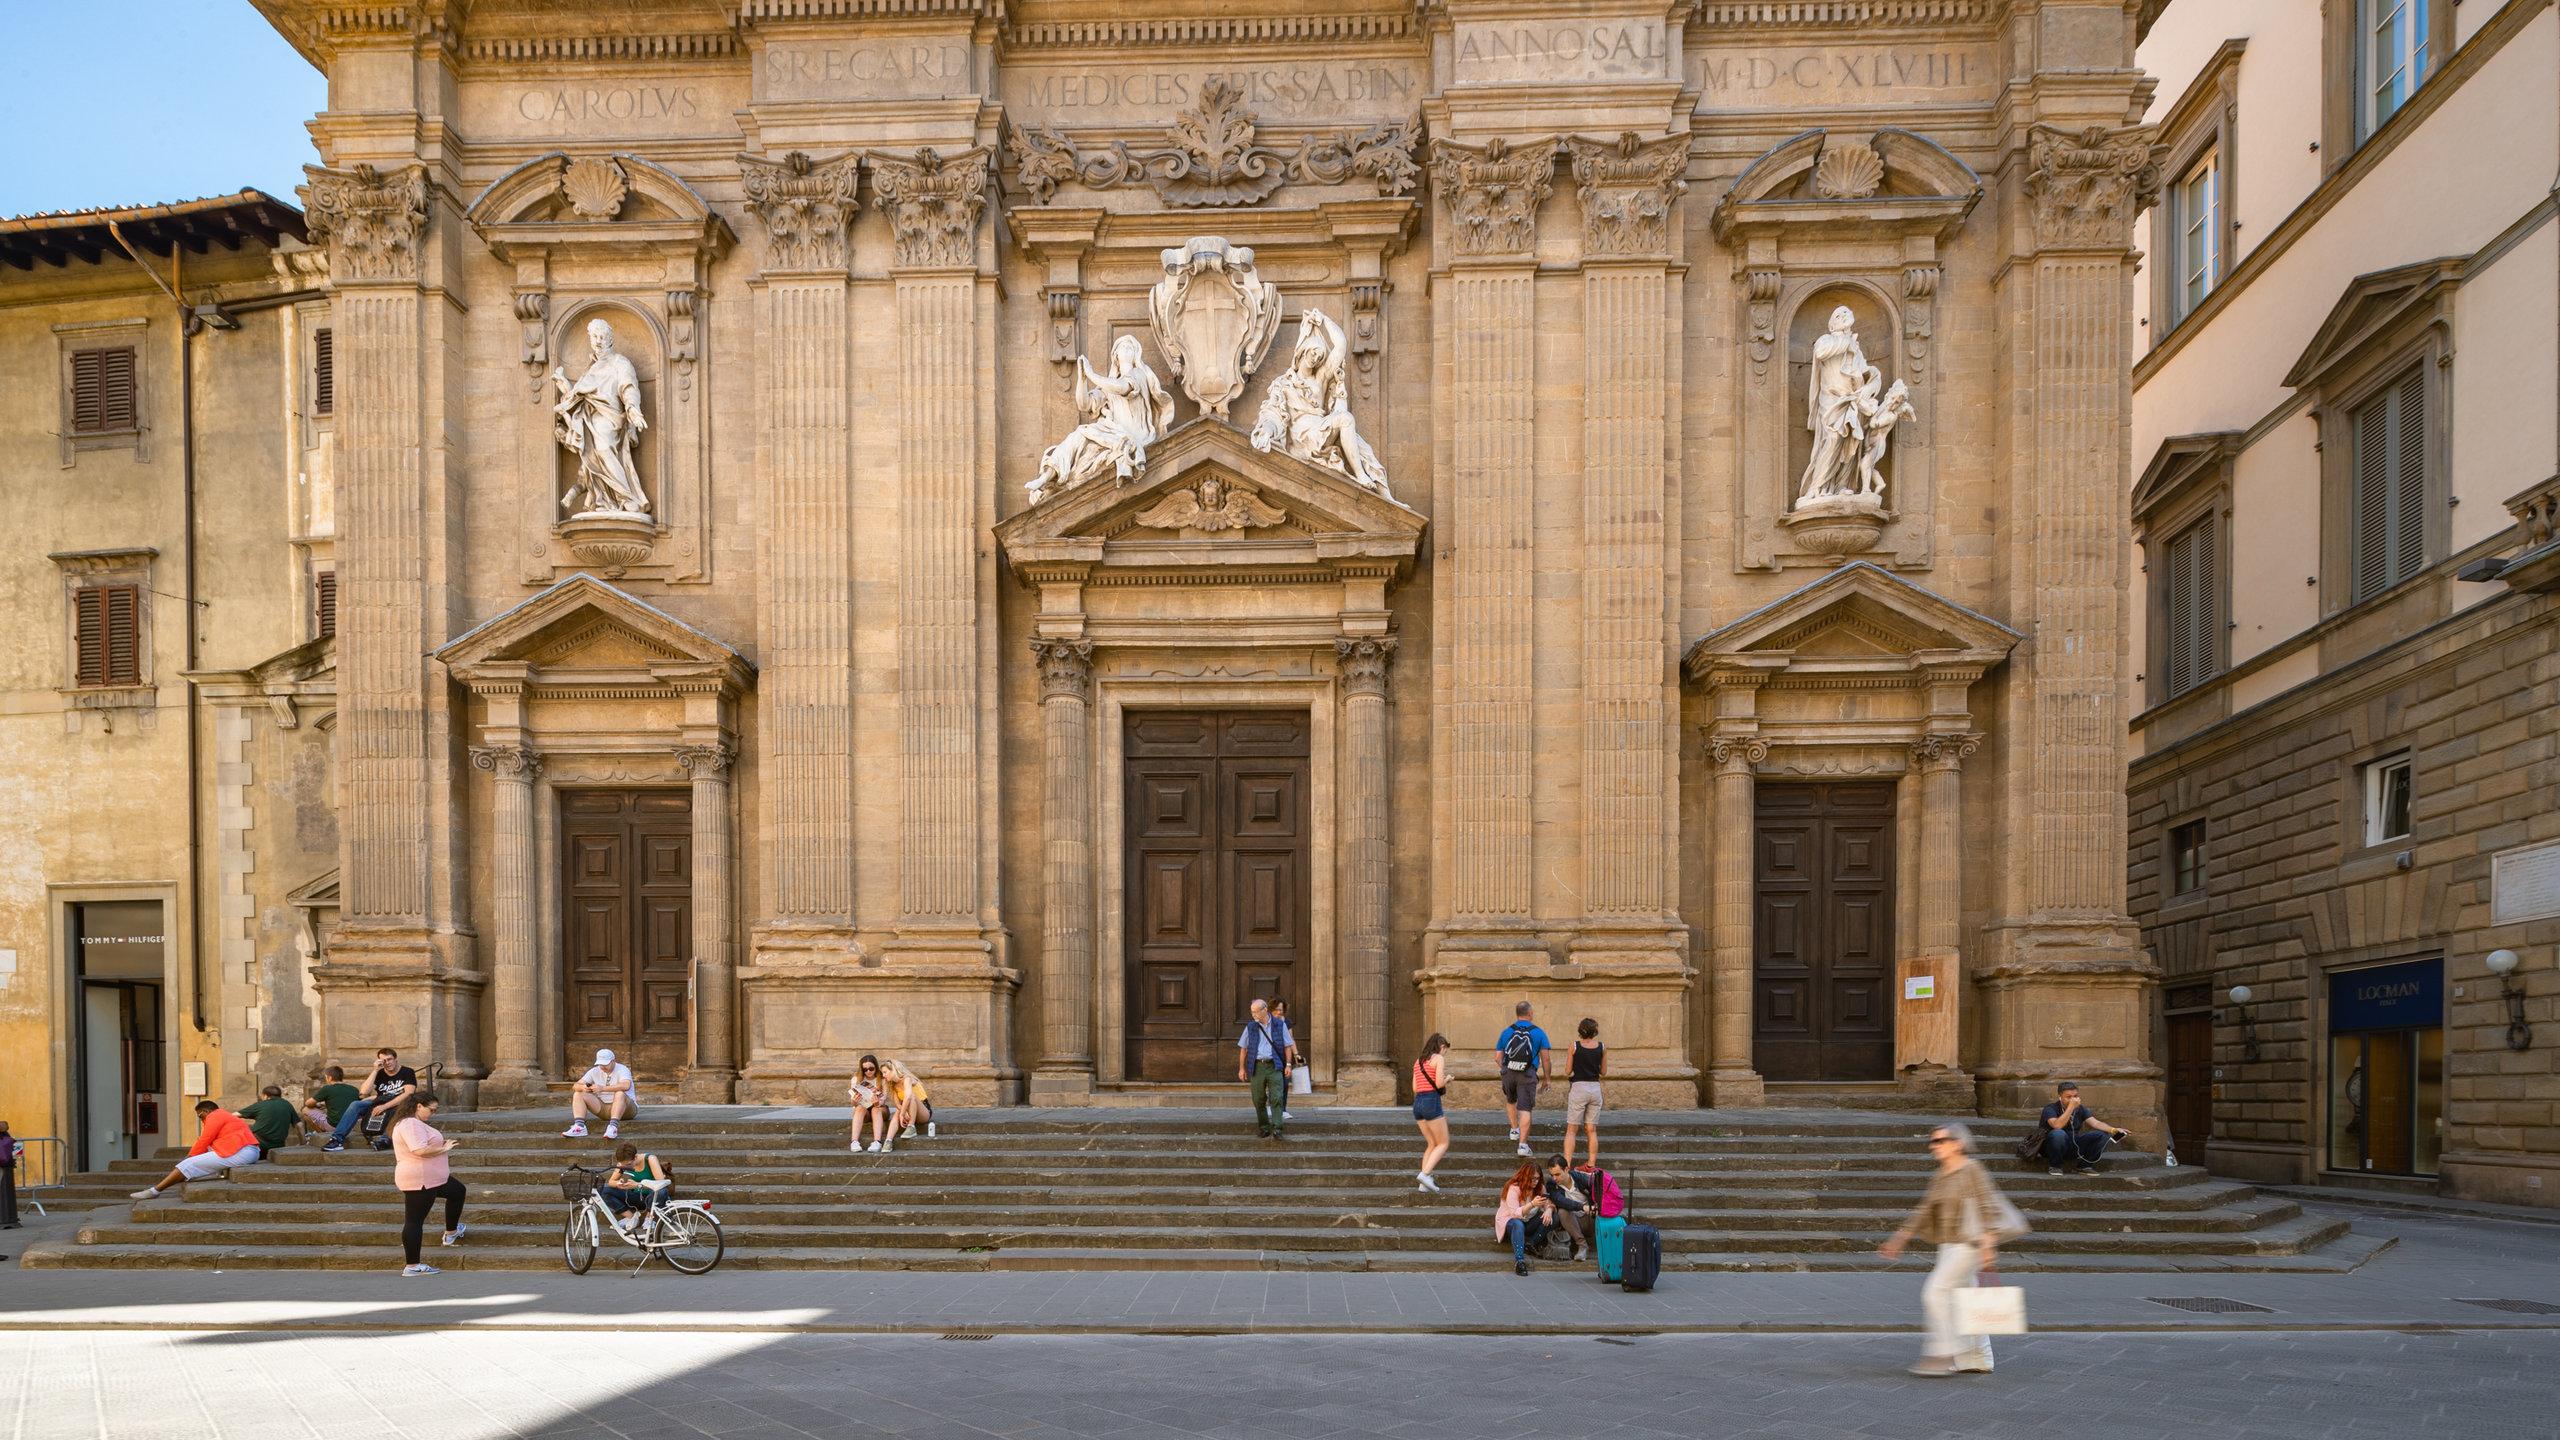 Dom, Florenz, Toskana, Italien